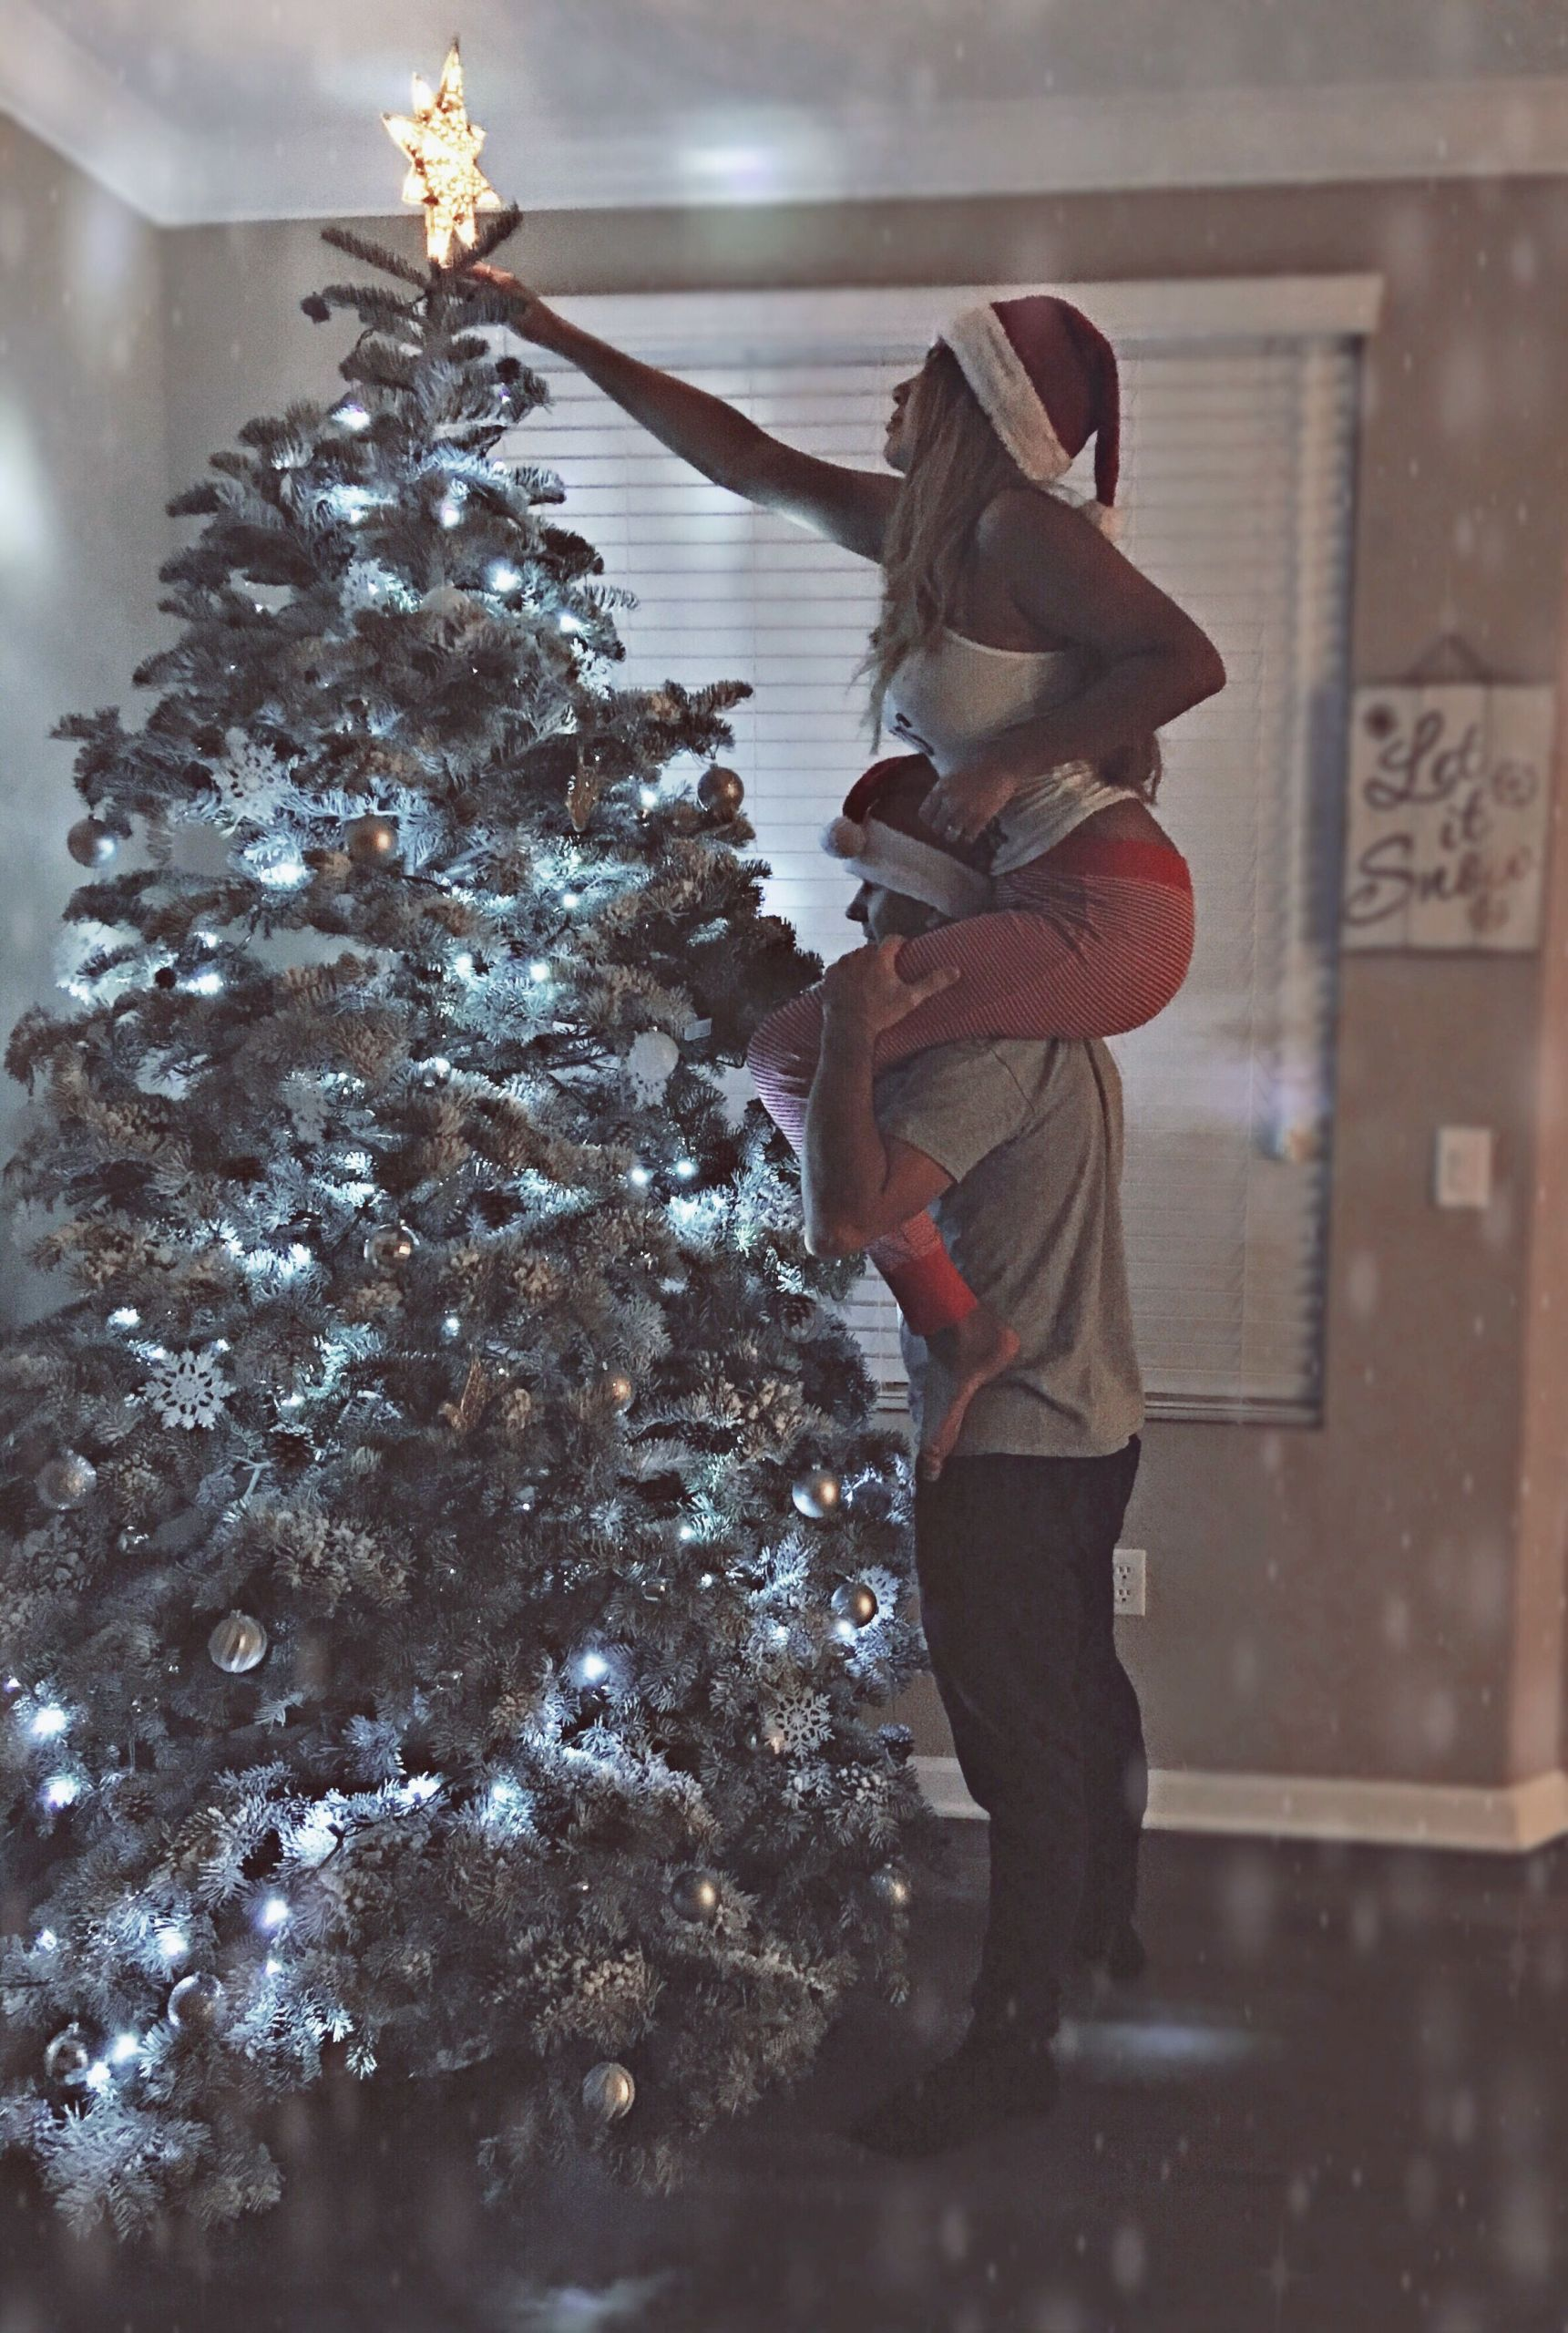 Christmas Gift Ideas For Young Married Couples  selenakulikovskiy danikkulikovskiy instagram couple